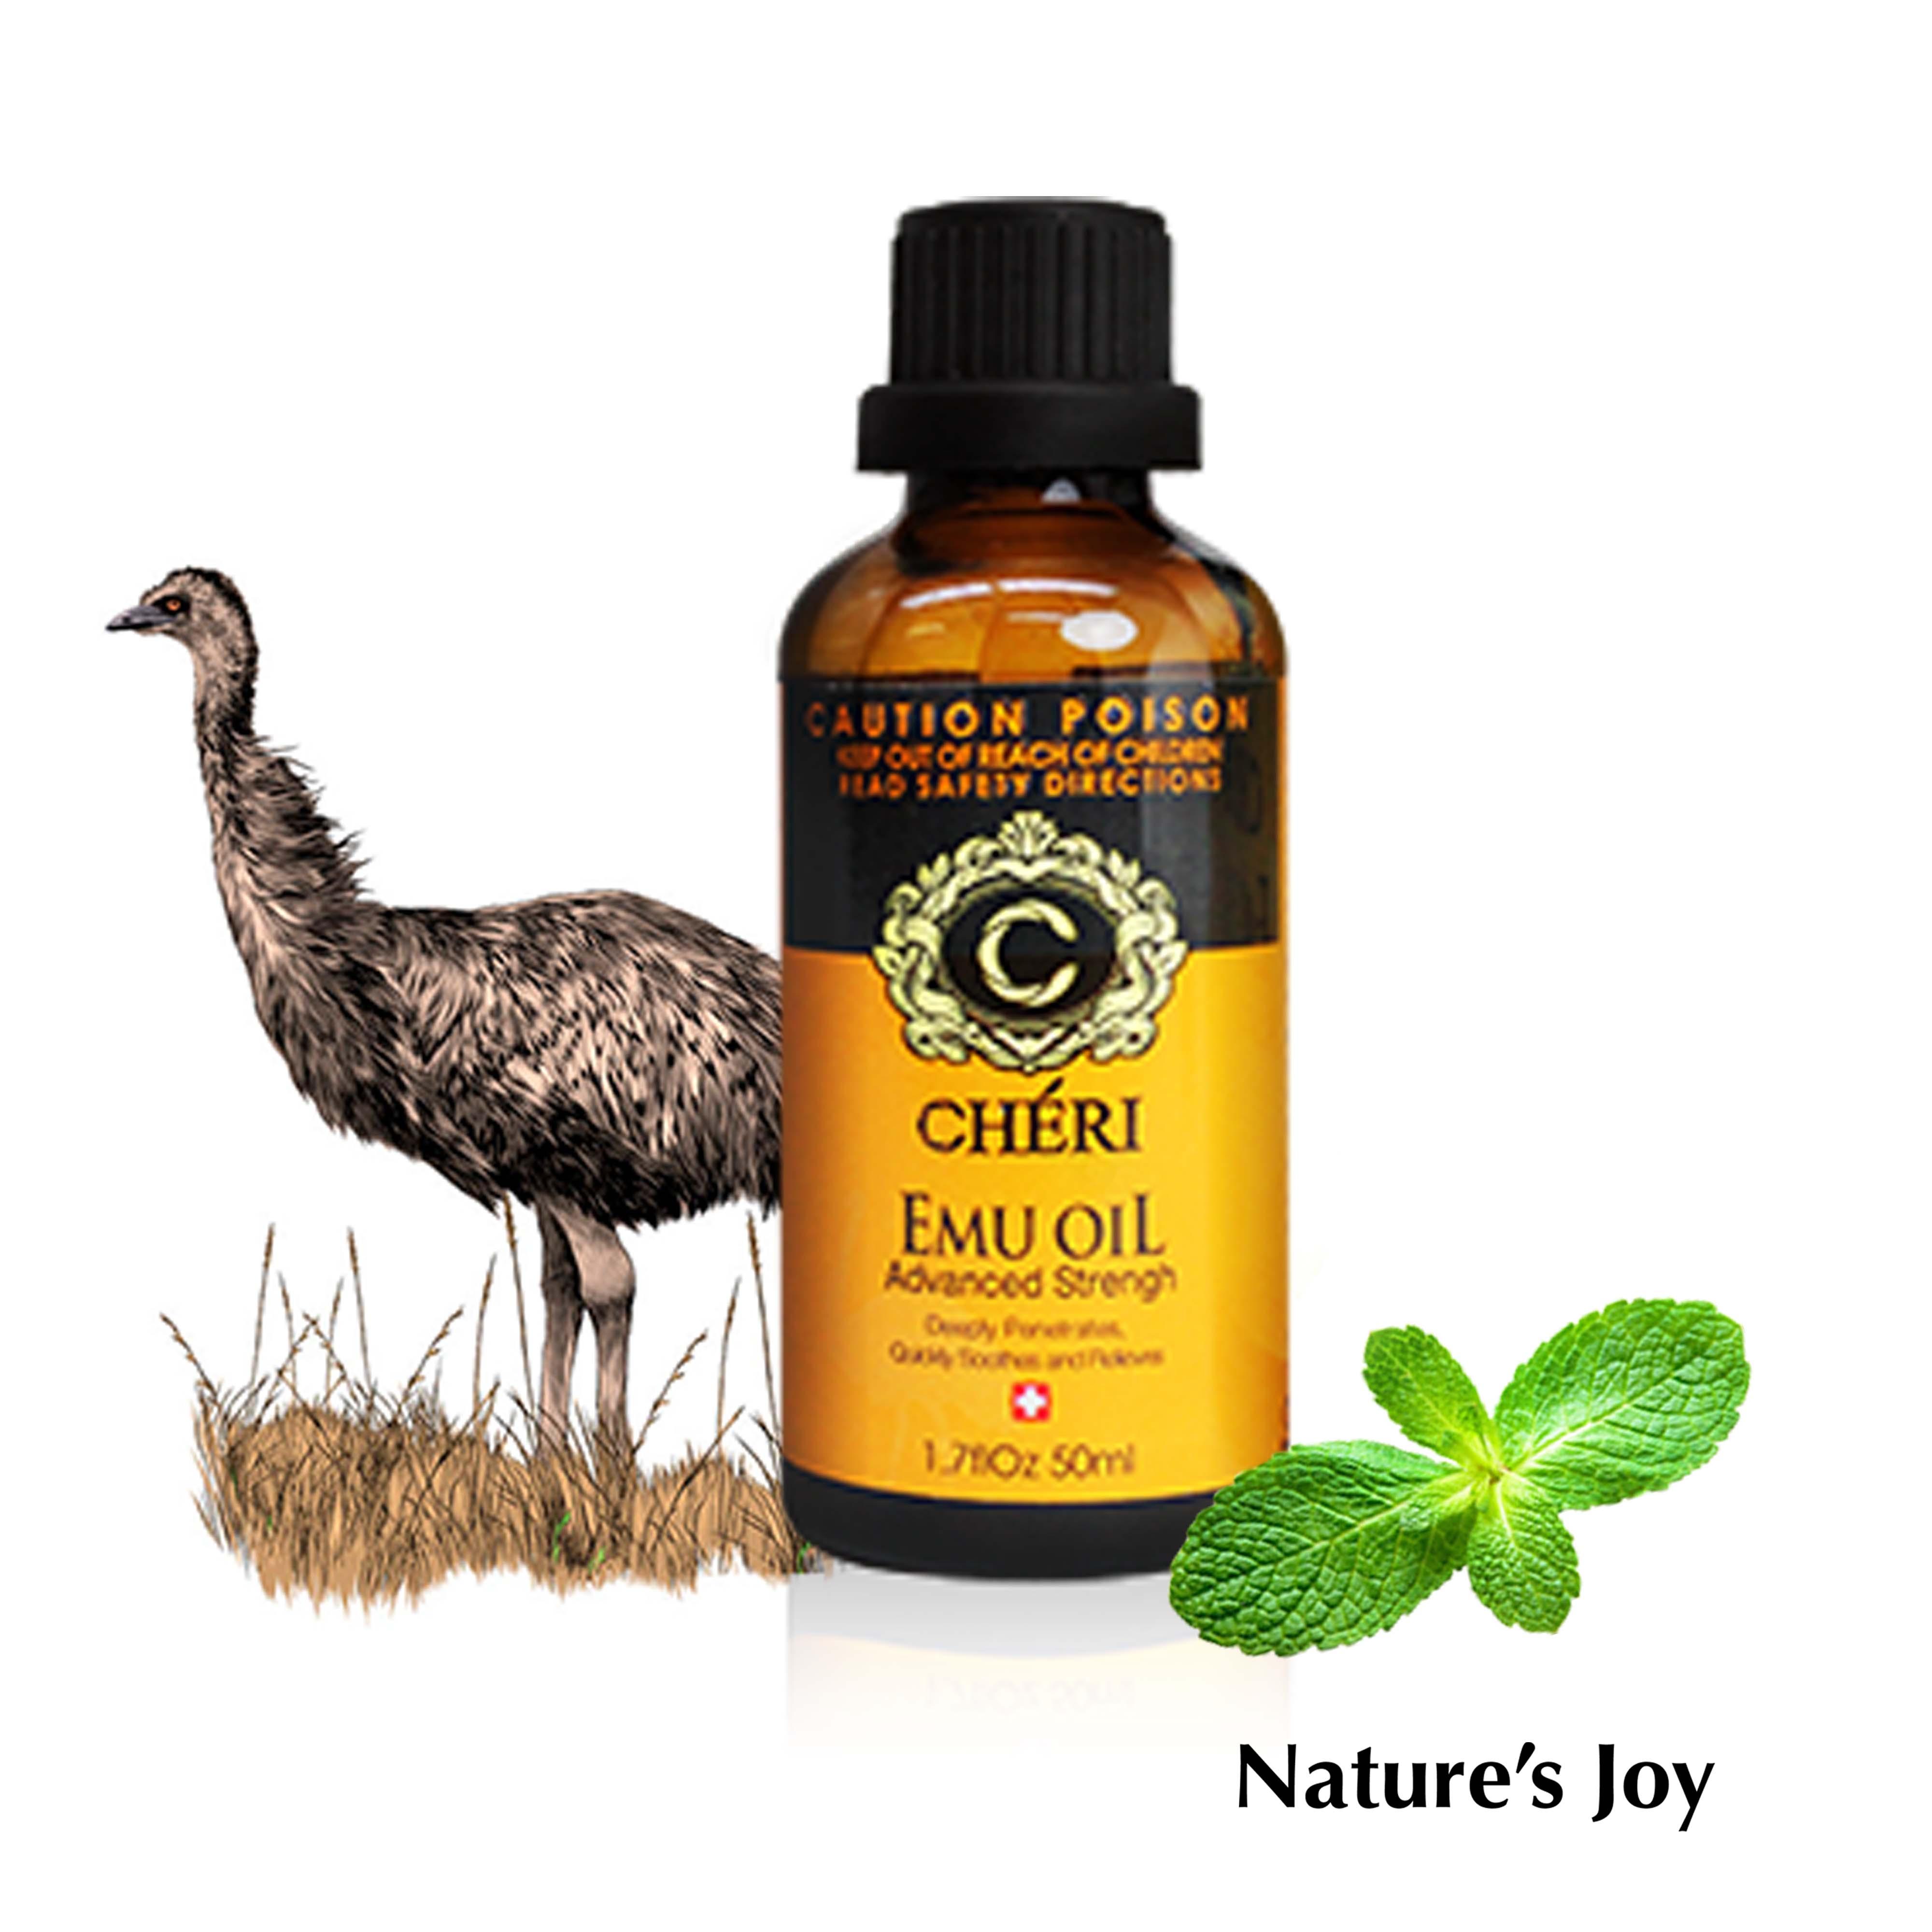 Nature's Joy 澳洲強效鴯鶓精油 / 澳洲維骨力 外用 / 澳洲原裝 / 推拿大師 / 舒緩精油 / 按摩油 0